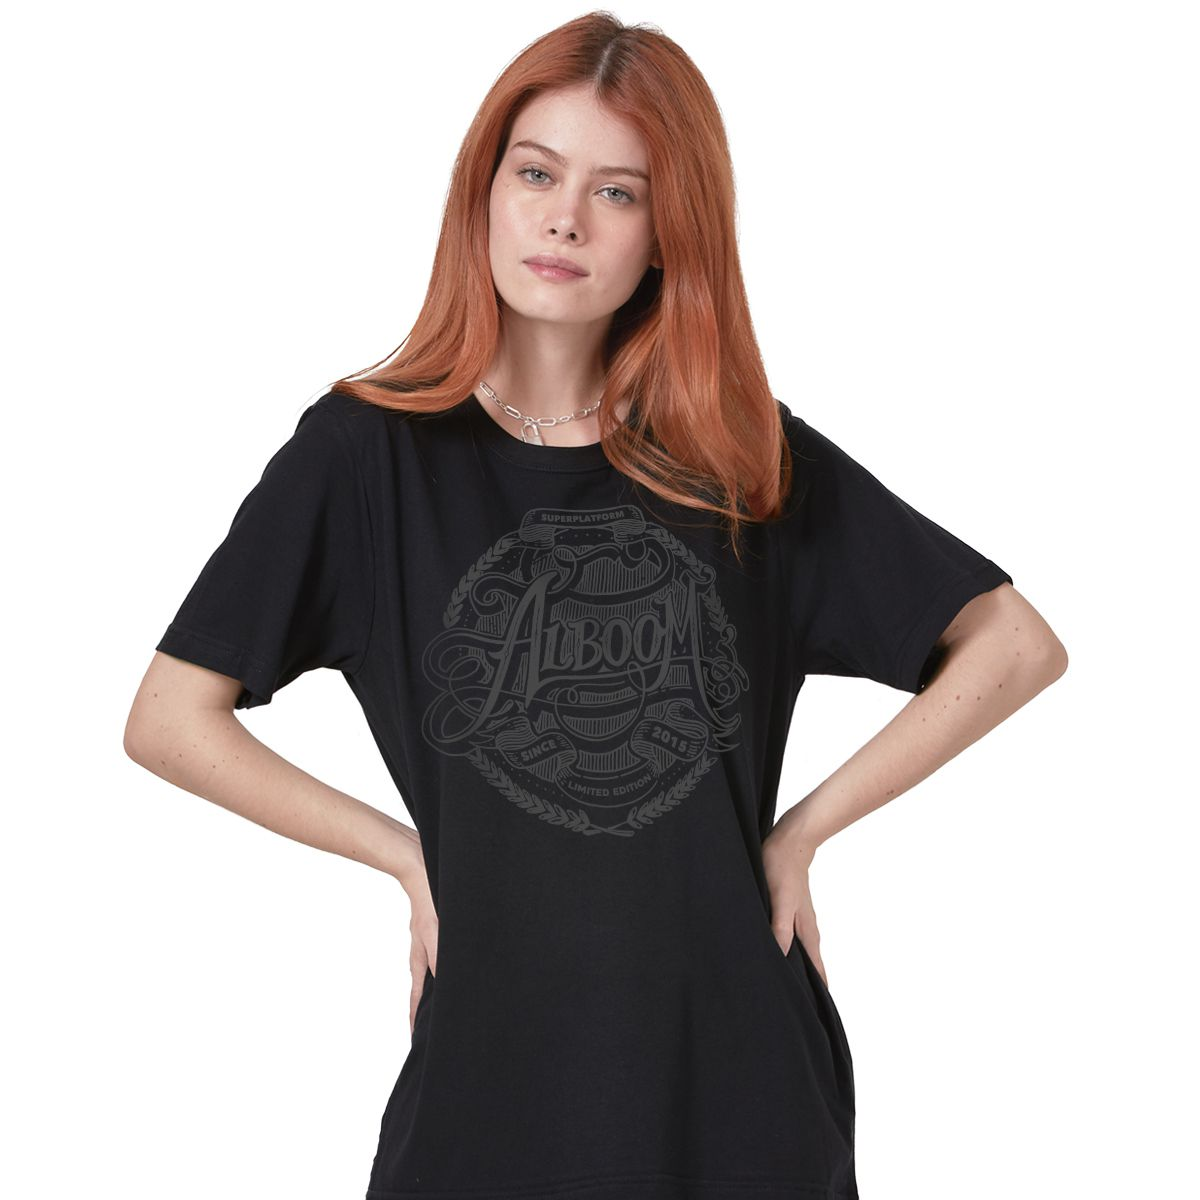 T-shirt Feminina Alboom